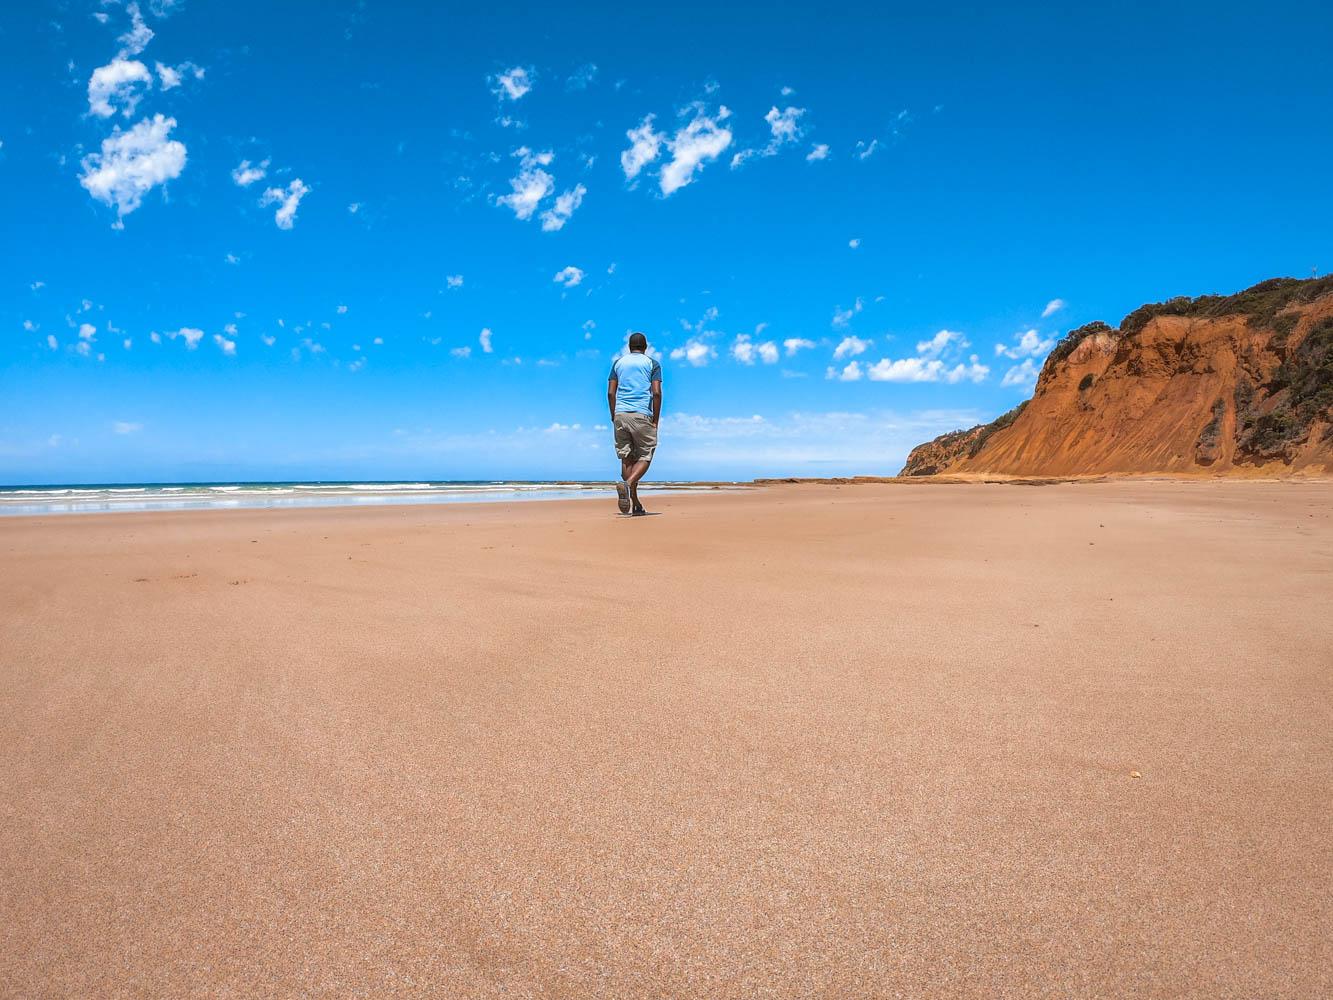 Strolling on the Sunnymead Beach